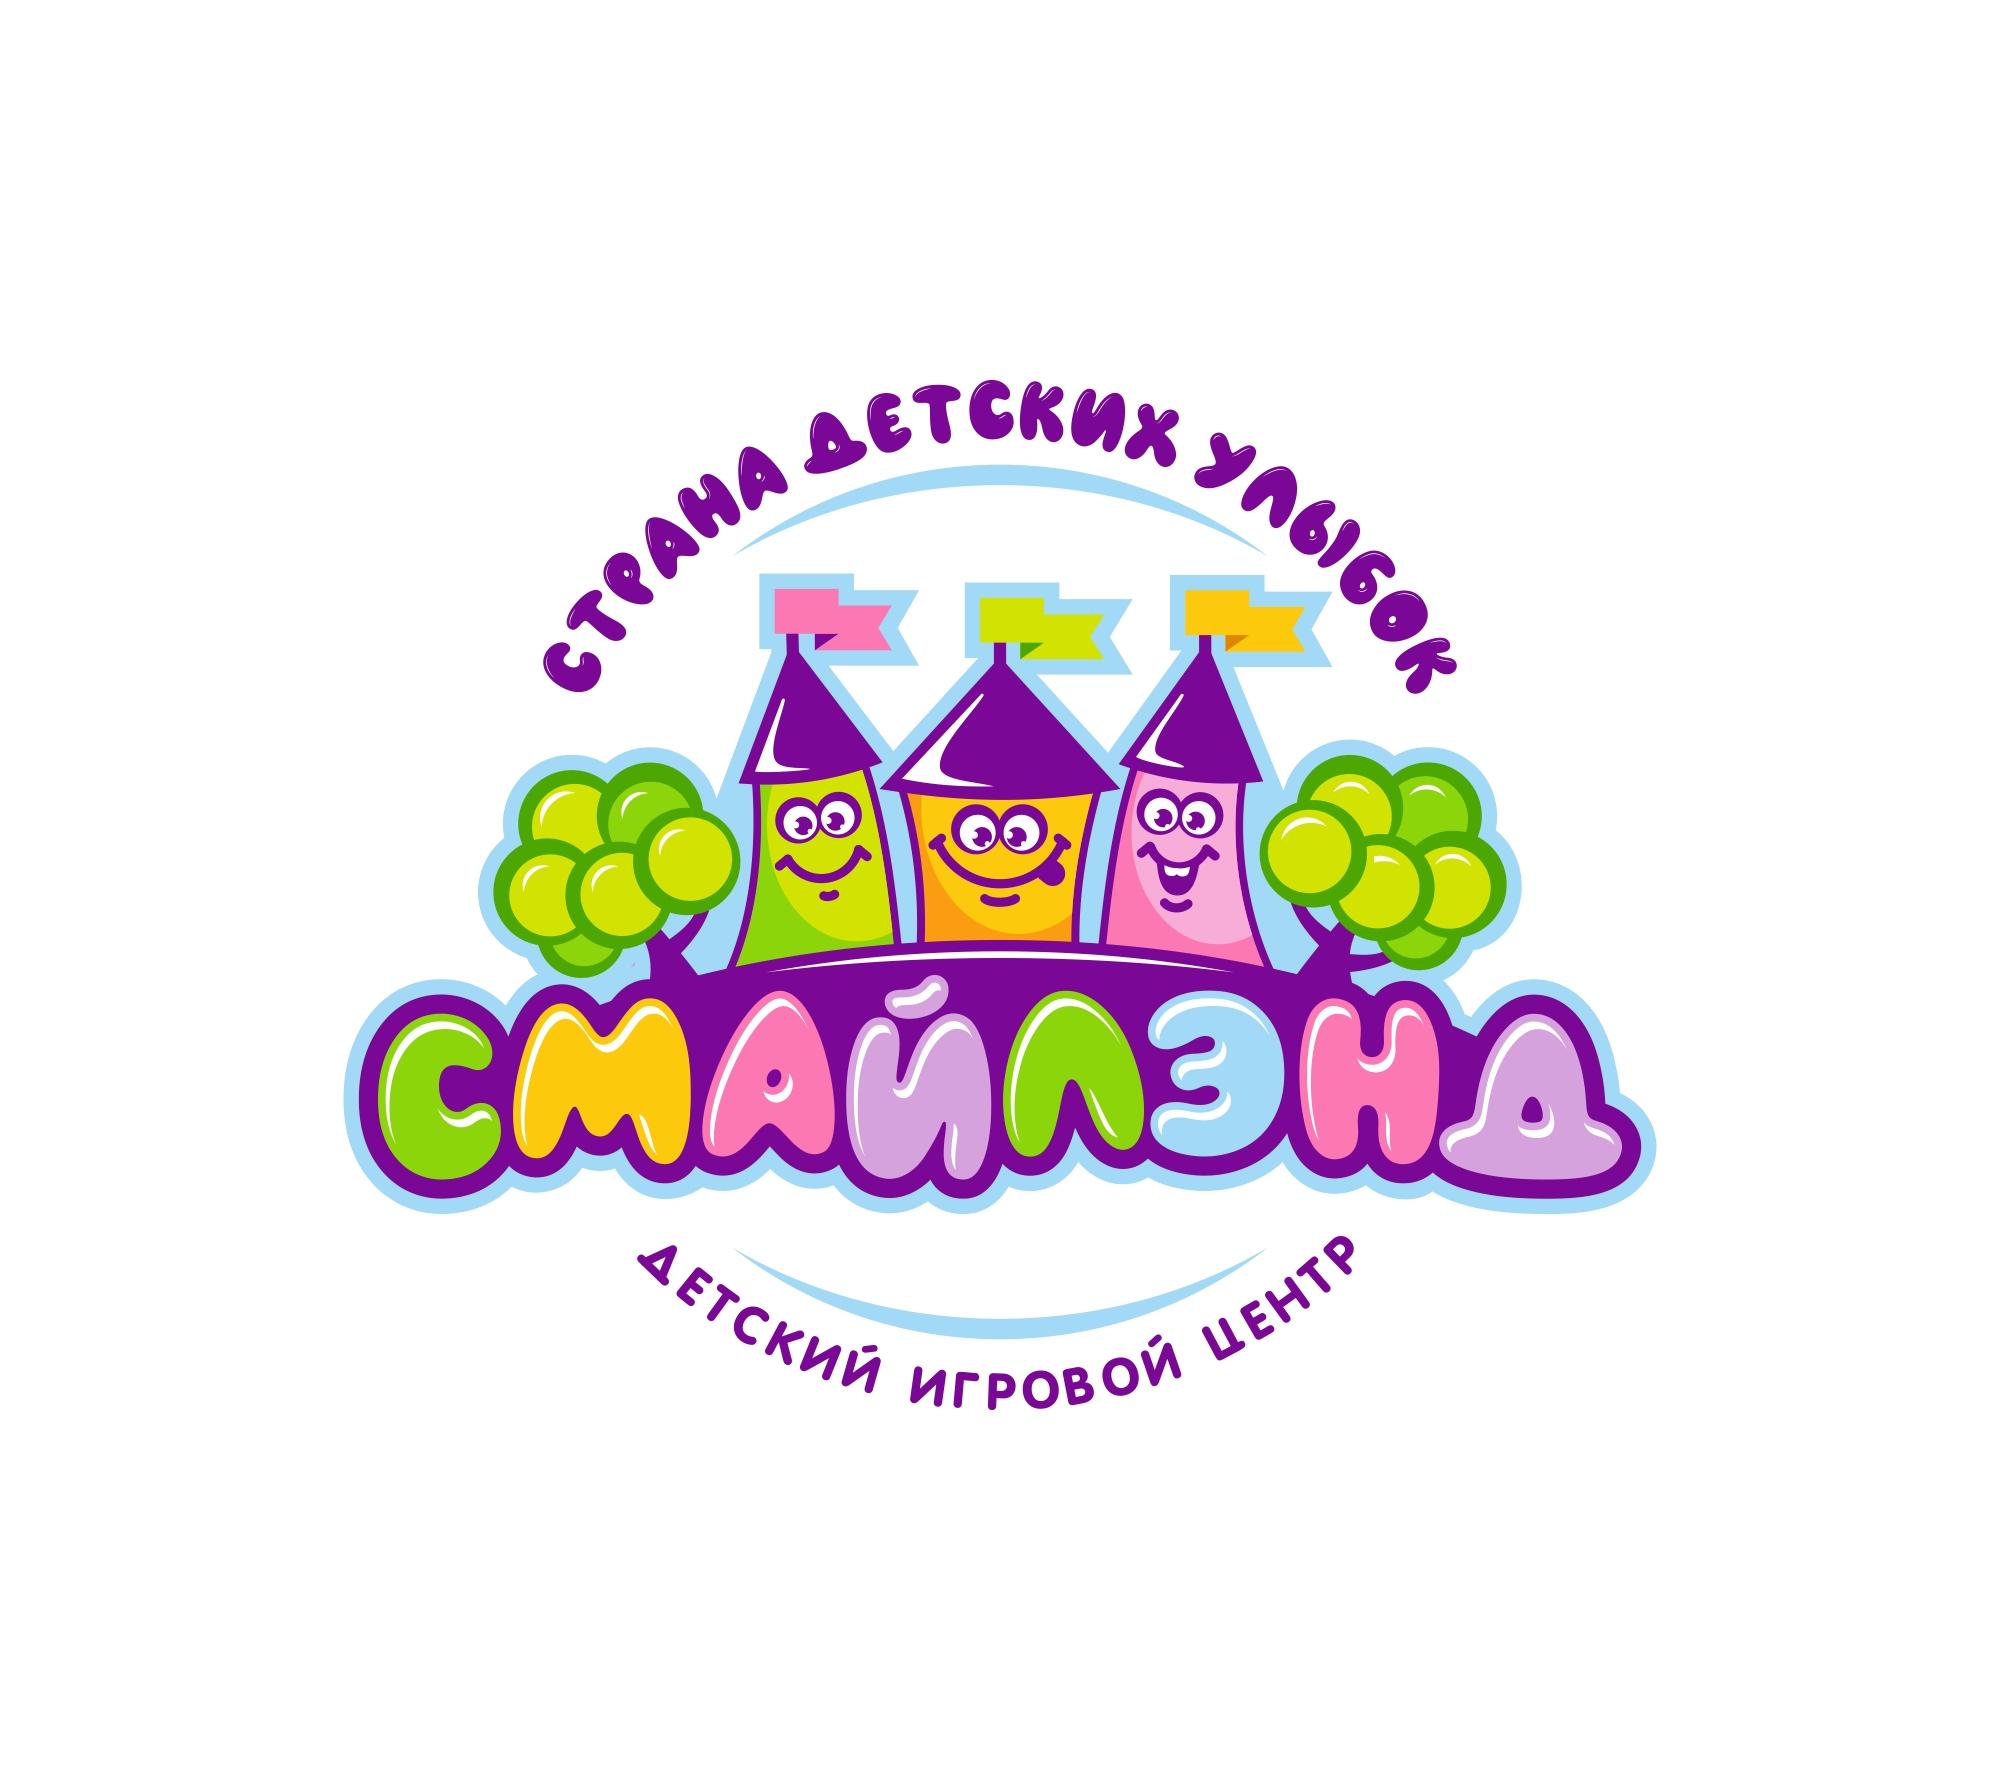 Логотип, стиль для детского игрового центра. фото f_8565a3f5a3114546.jpg